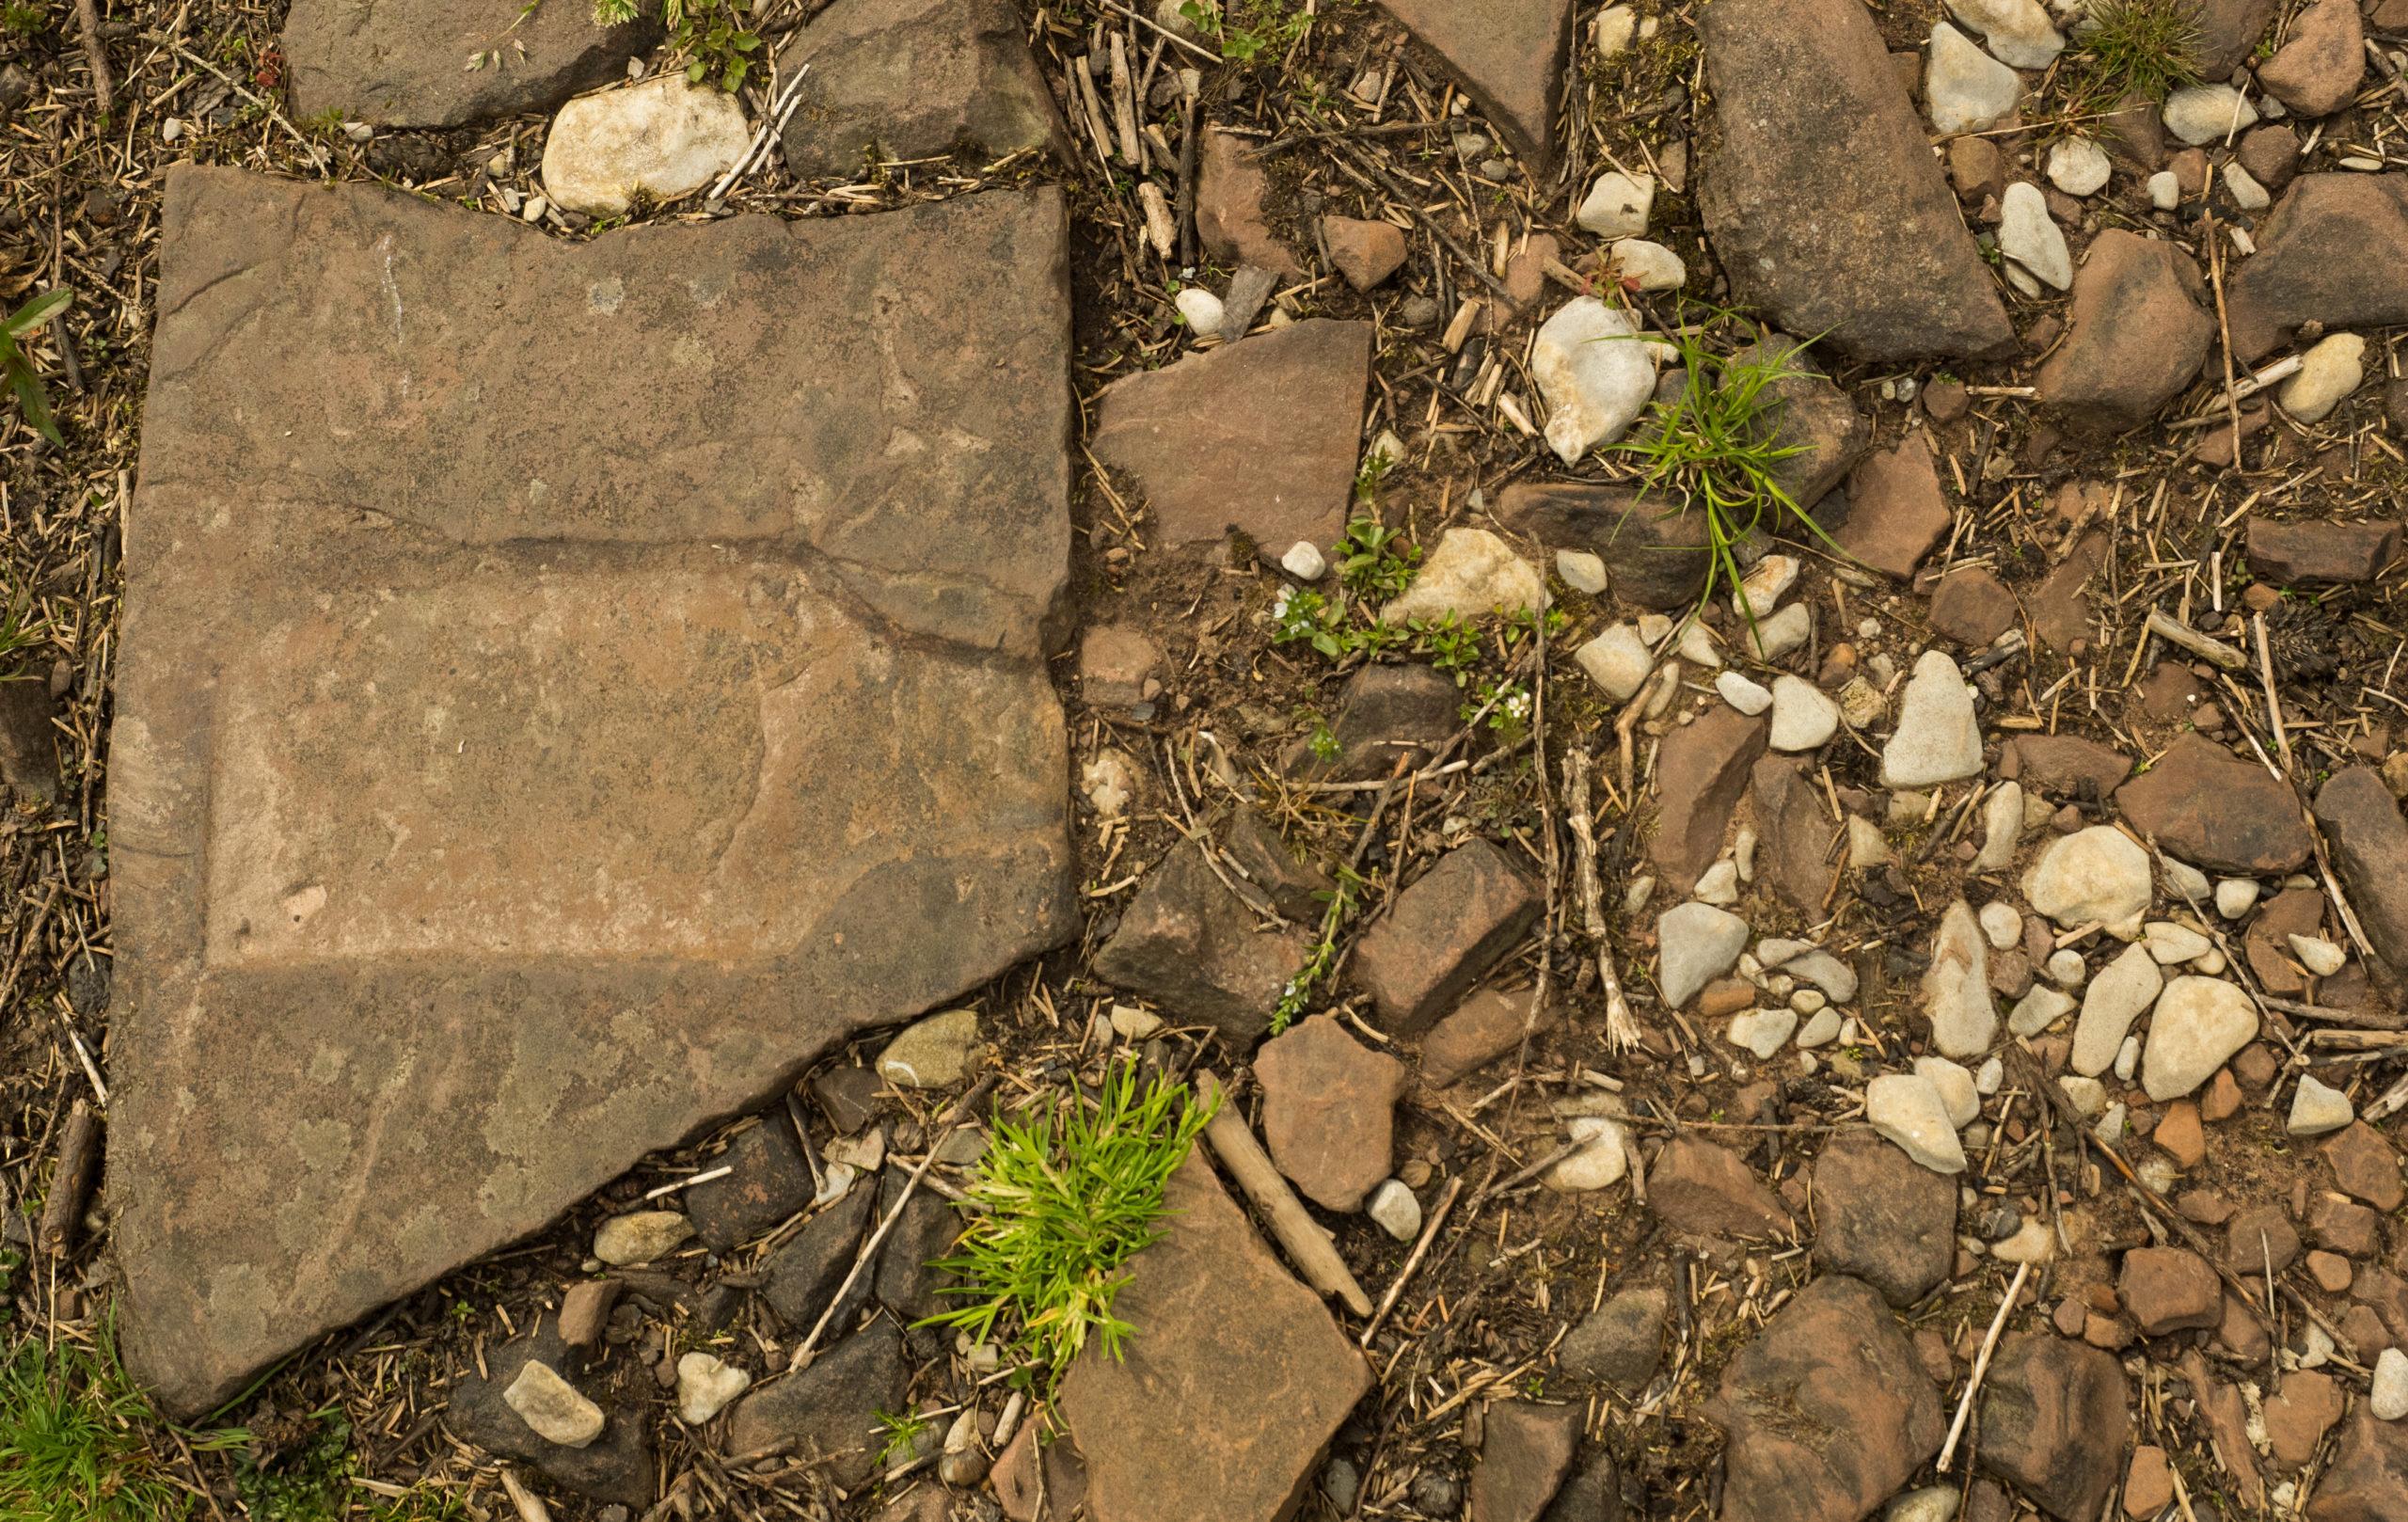 Brinore Tram Road stone with tie bar imprint and limestone ballast